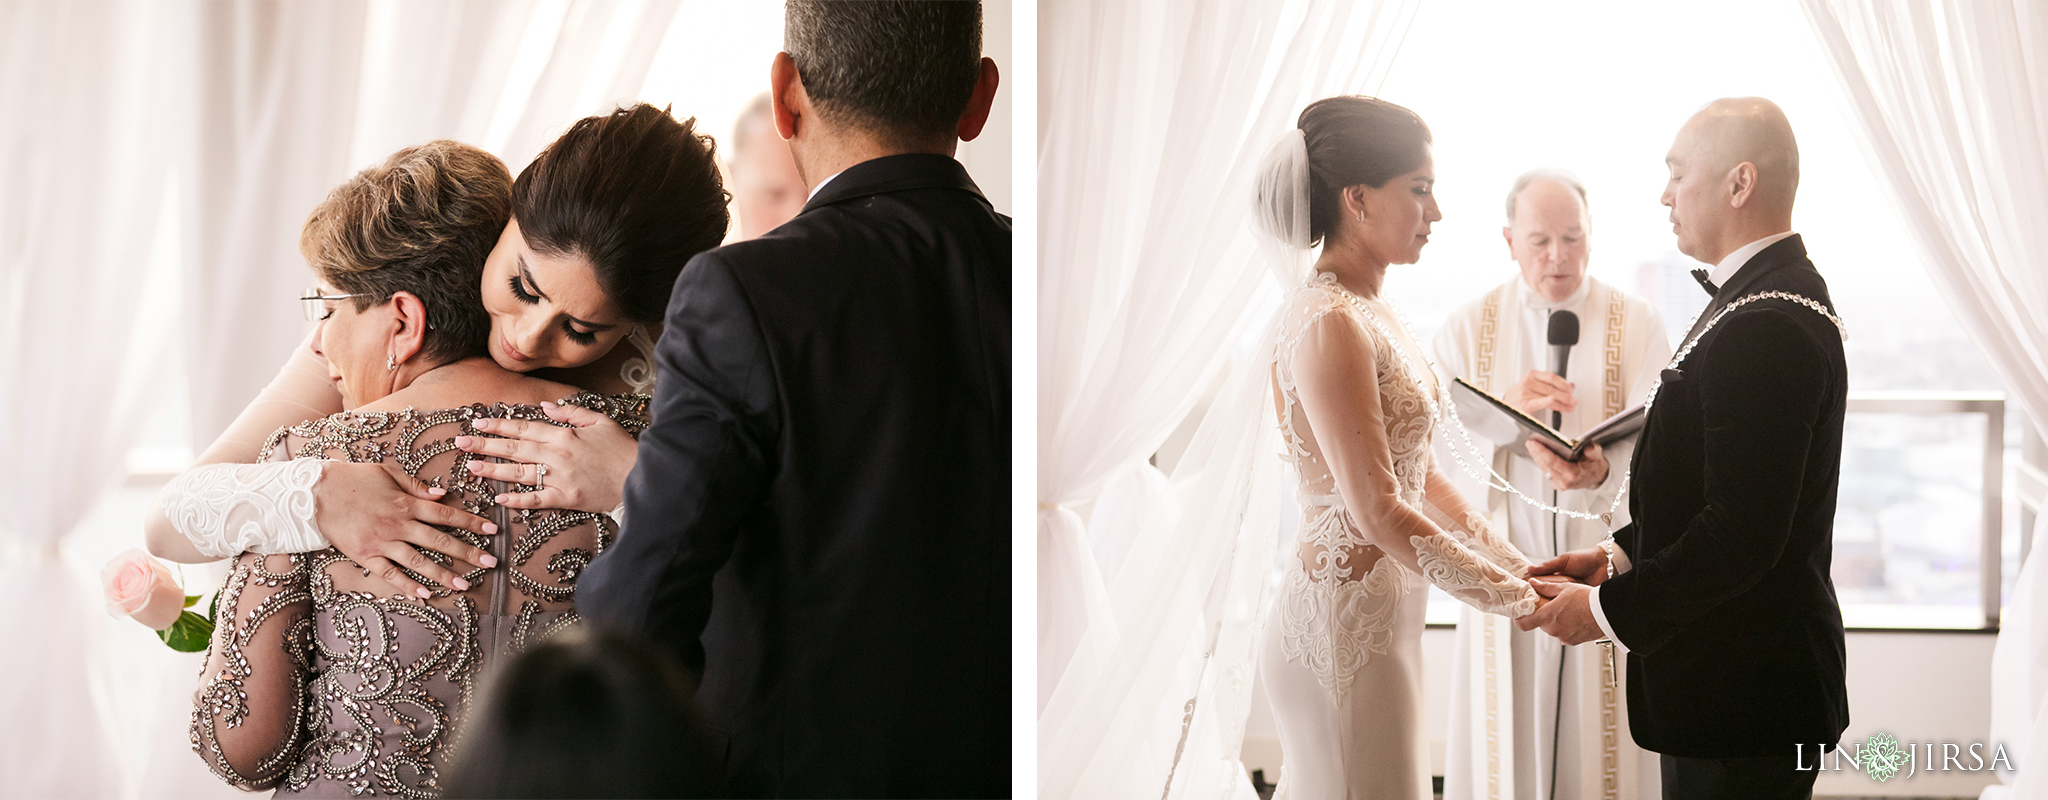 29 City Club Los Angeles Wedding Photography